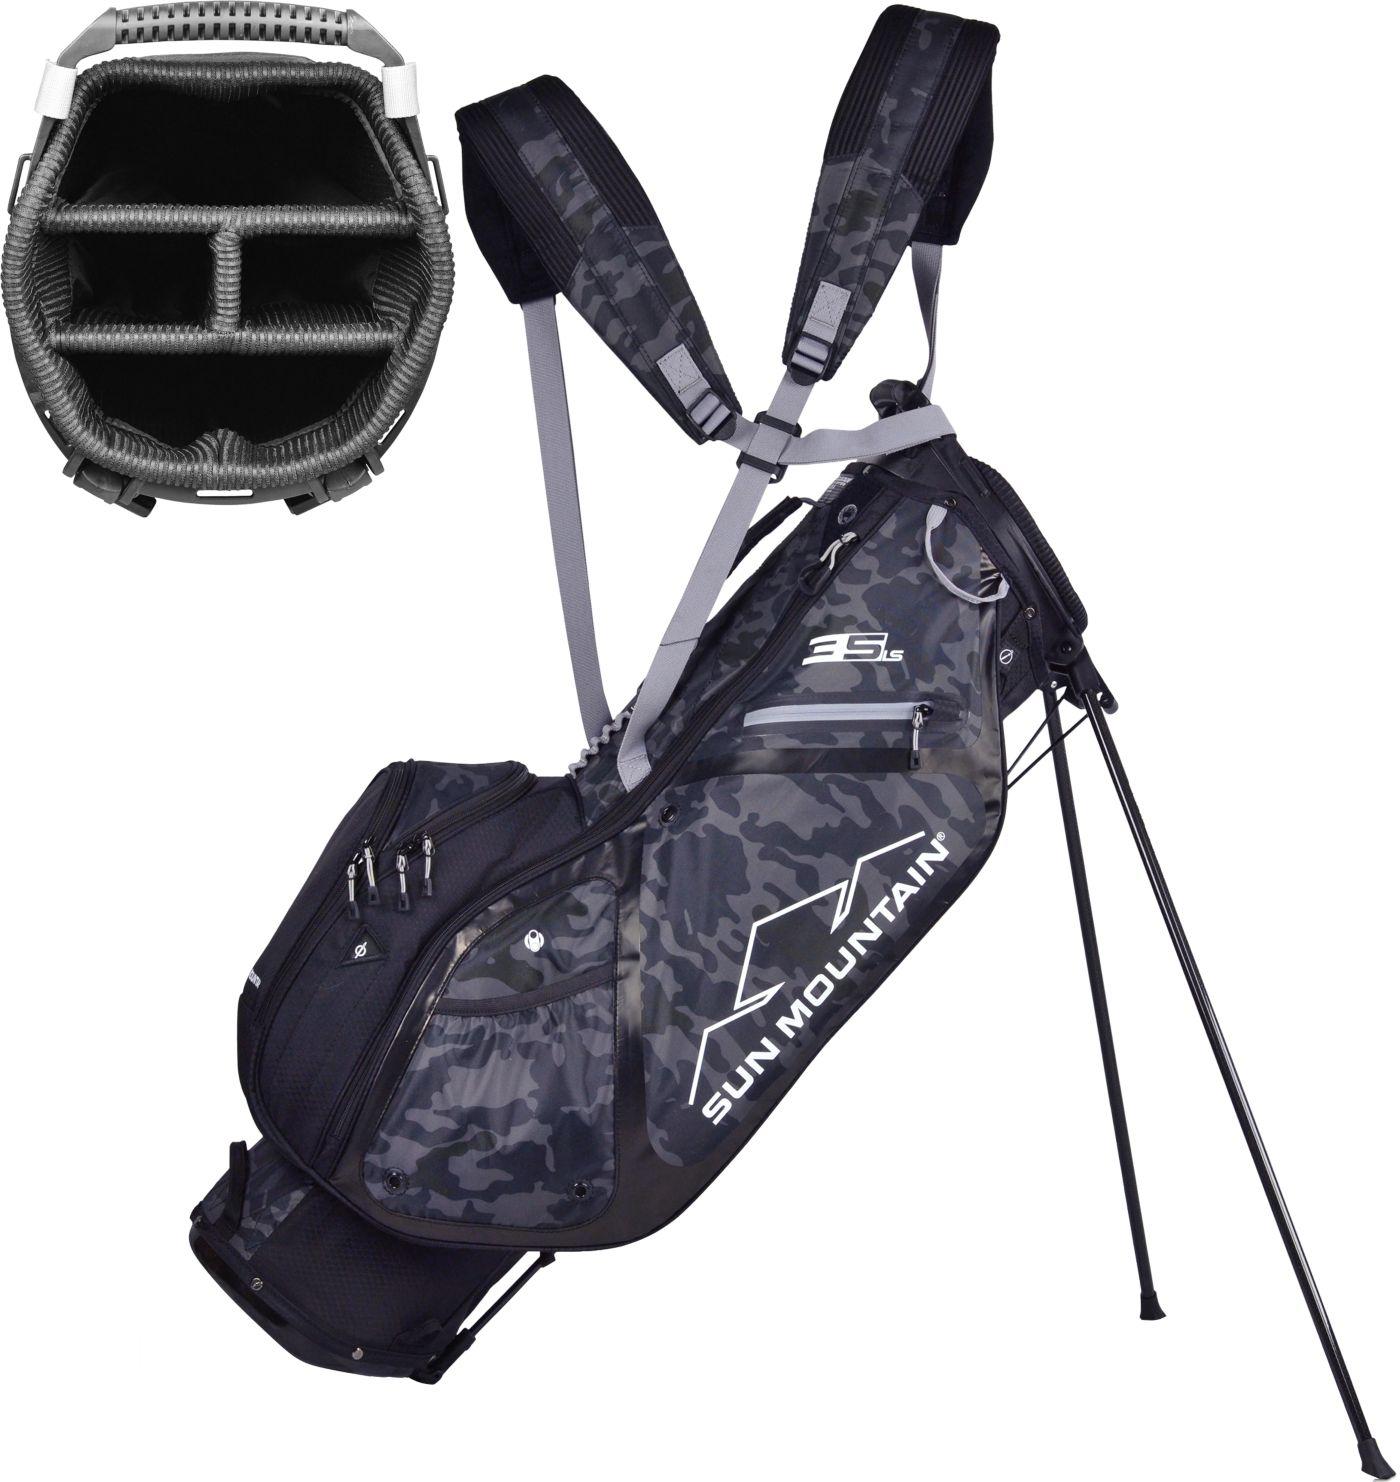 Sun Mountain 2019 3.5 LS Zero-G Stand Bag